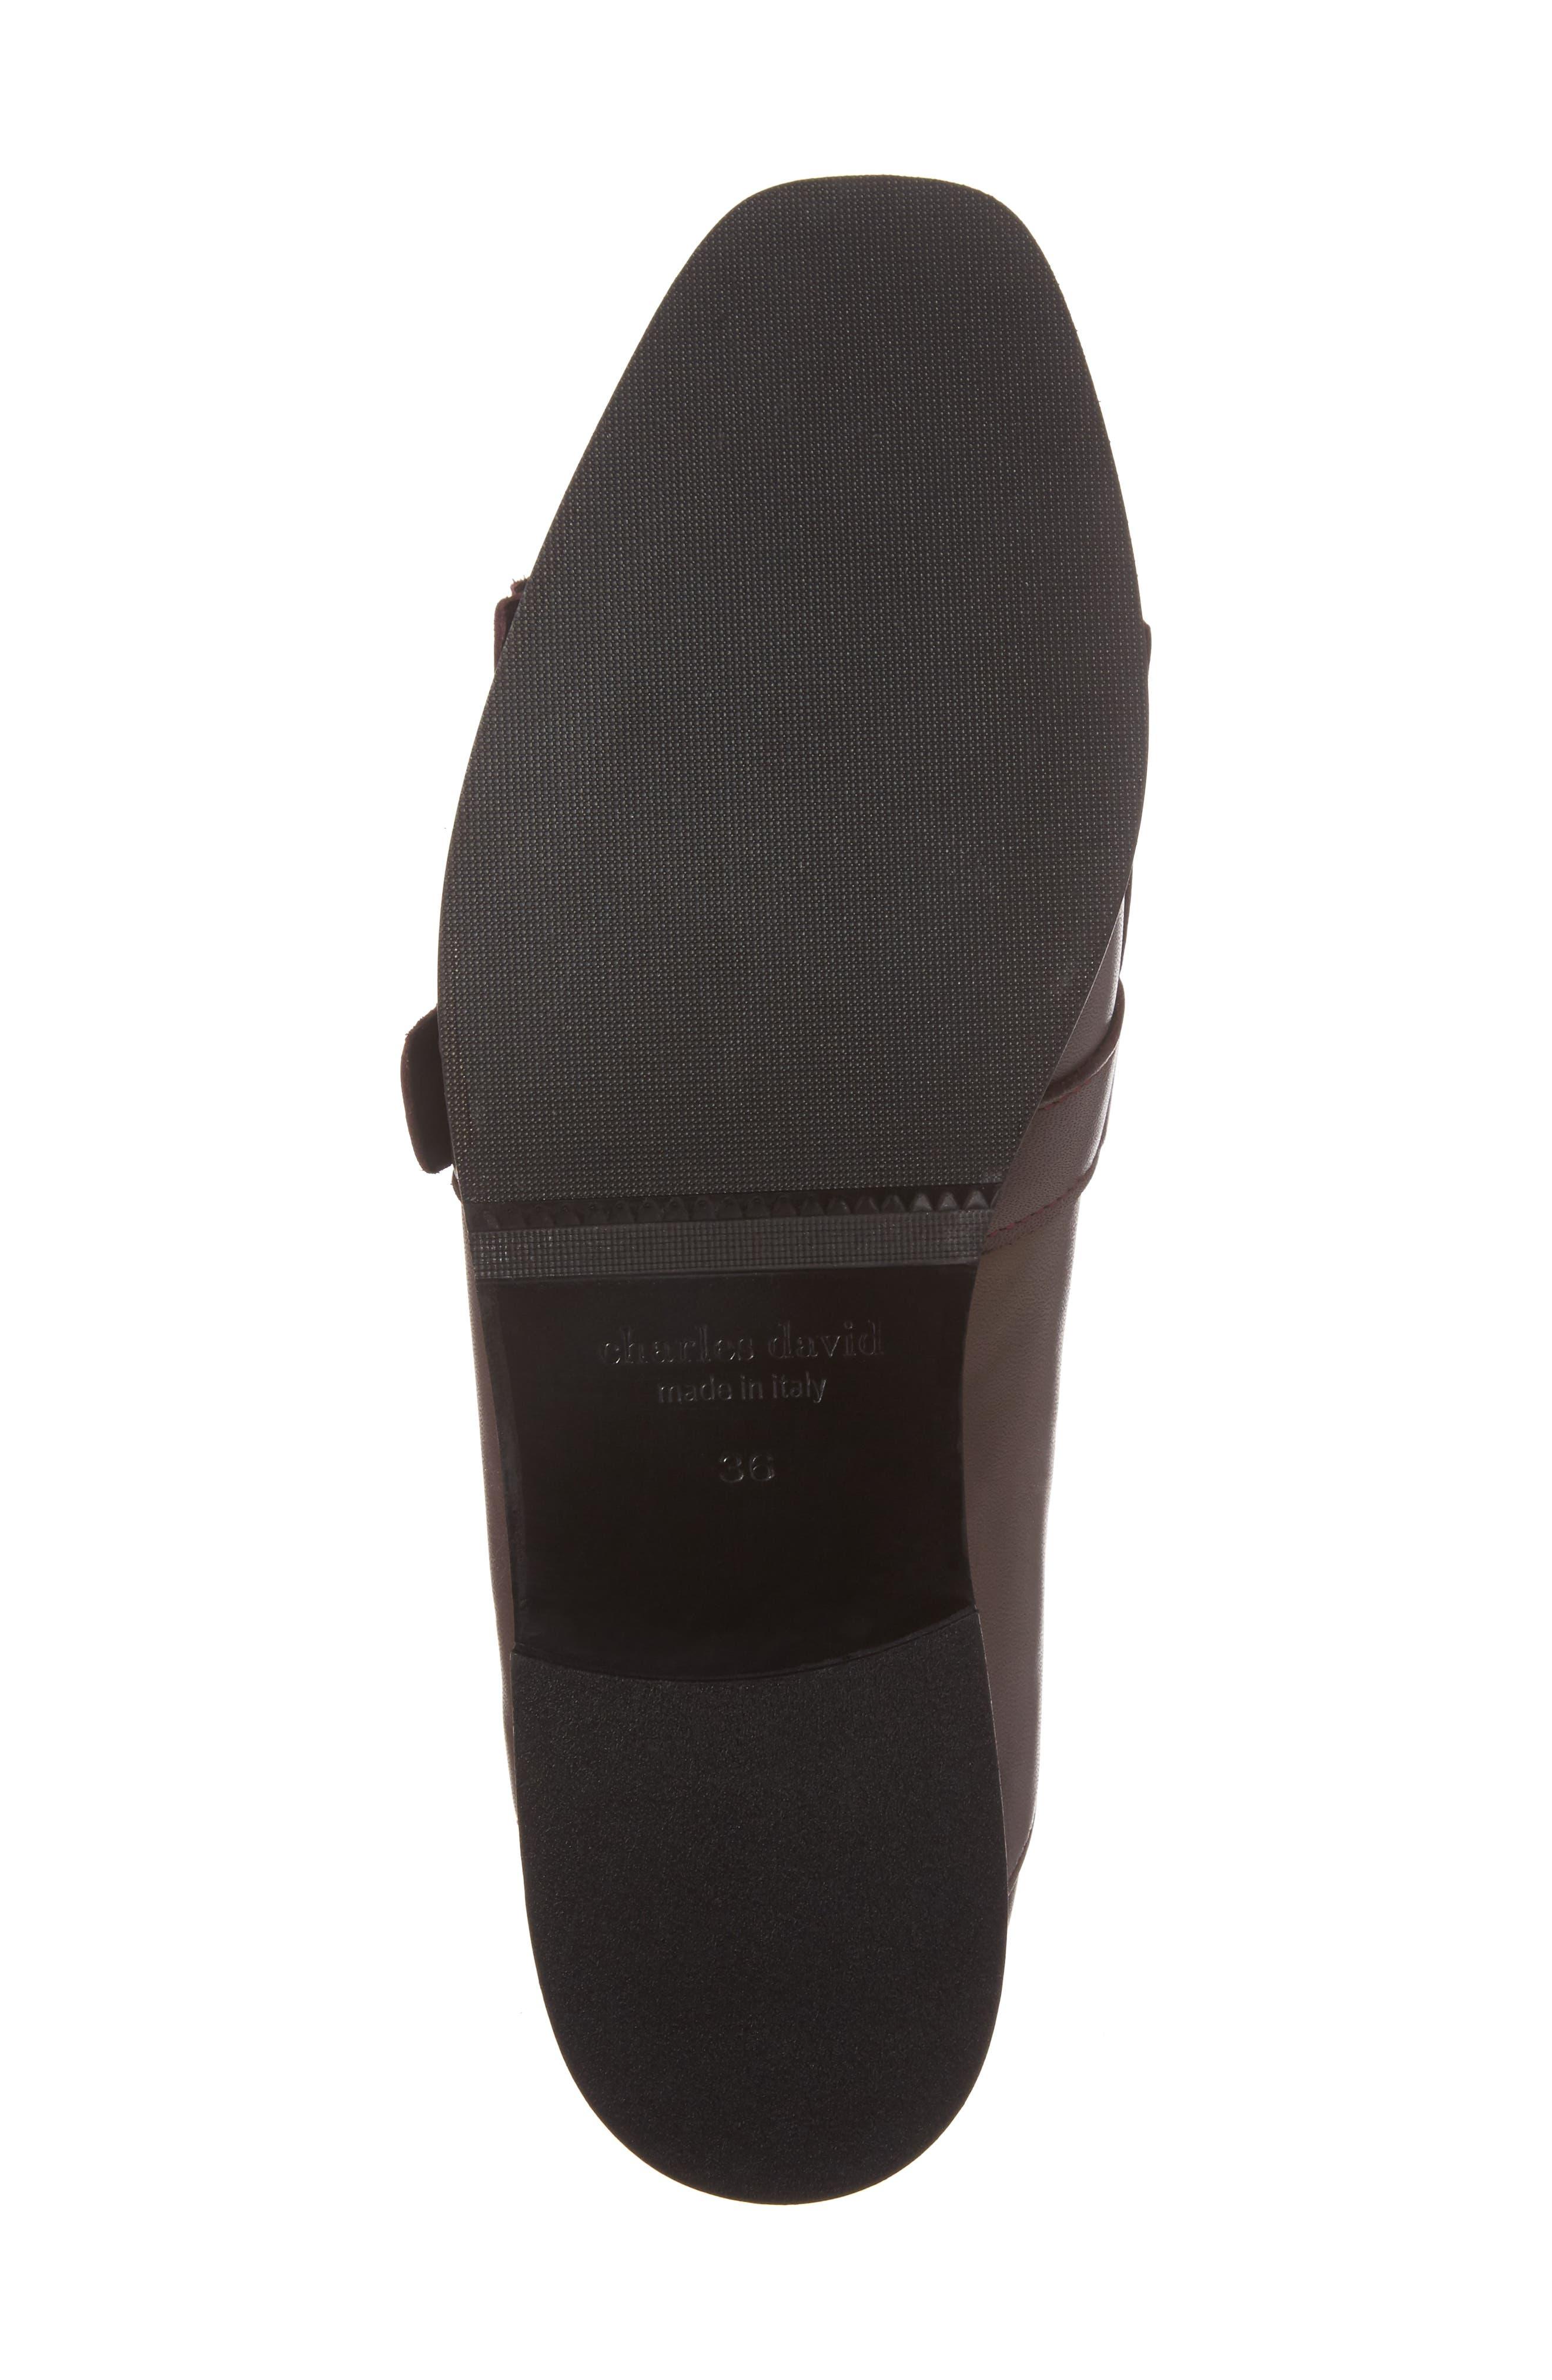 Dame Fringed Loafer Flat,                             Alternate thumbnail 6, color,                             Burgundy Leather